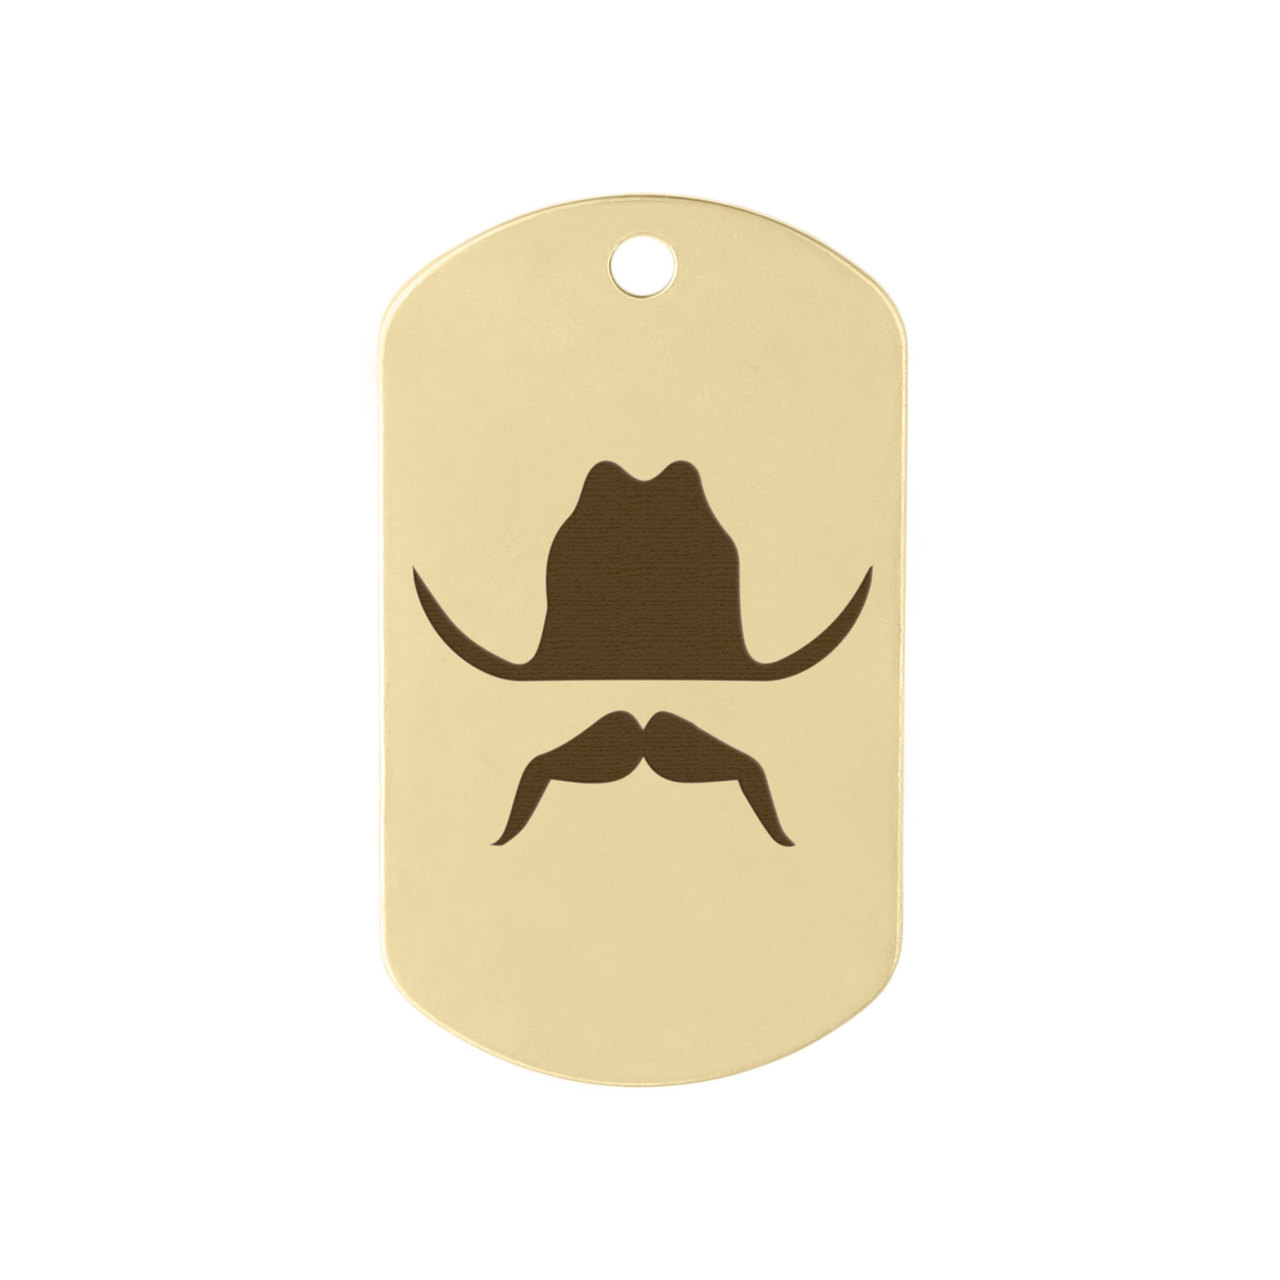 Mustache Design Dog Tags - Cowboy Mustache on Brass